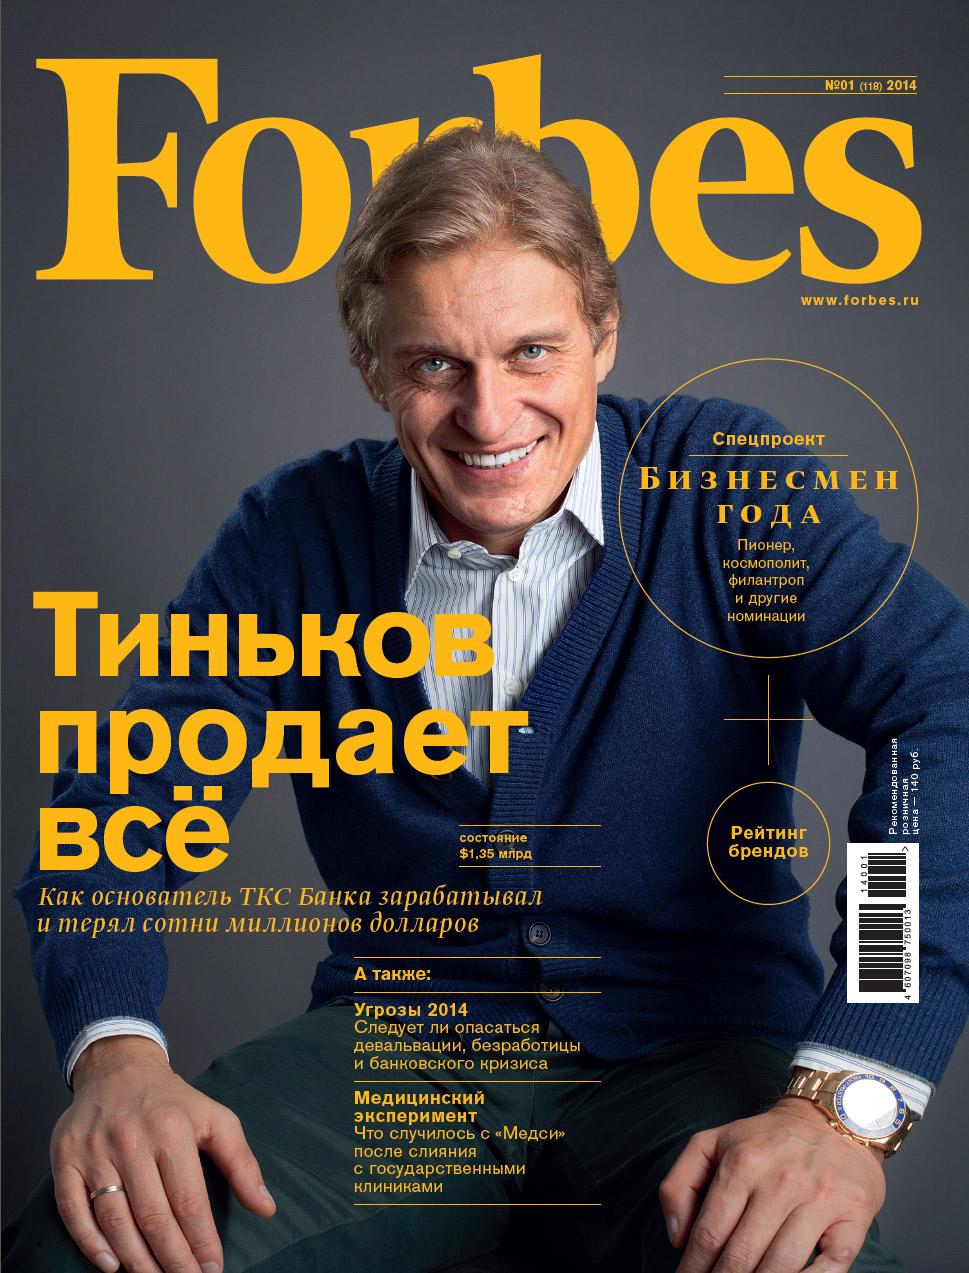 Обложка январского номера Forbes